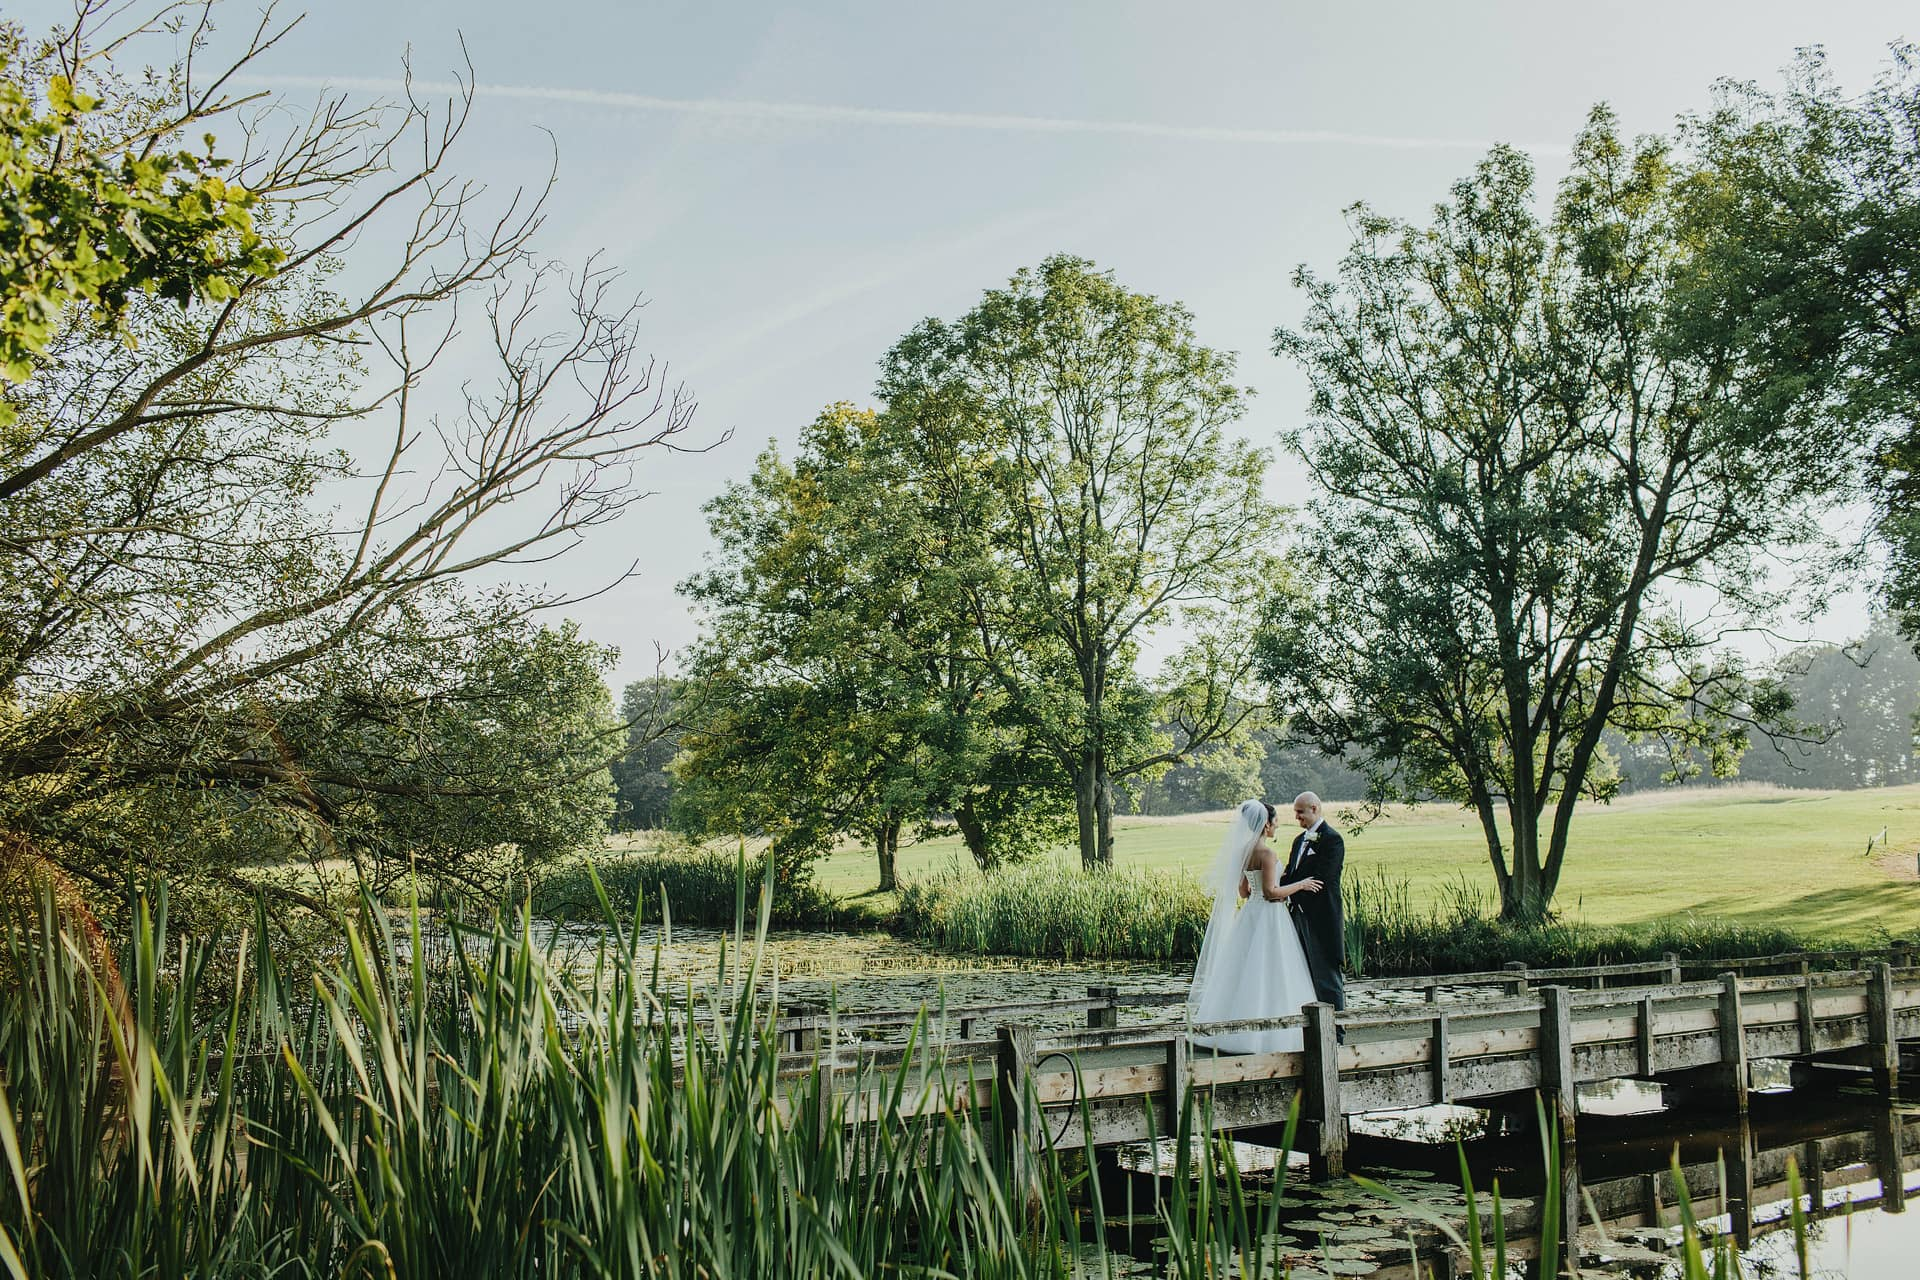 wedding photographer in the uk